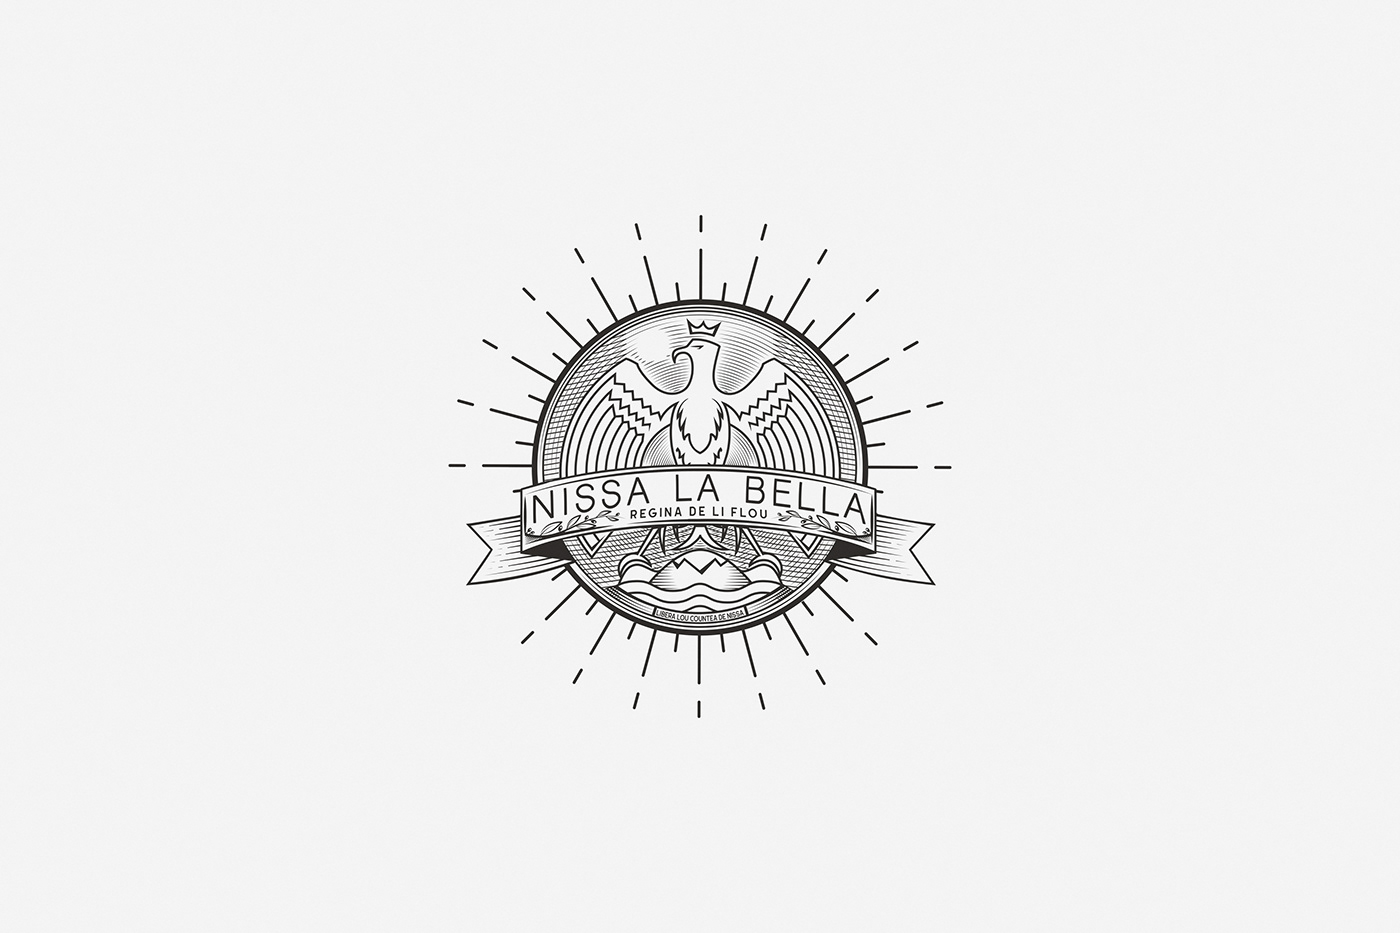 nice nissa Ville de Nice cote d'azur lecoupdulapin aiglon m'en bati logo emblem nissa la bella